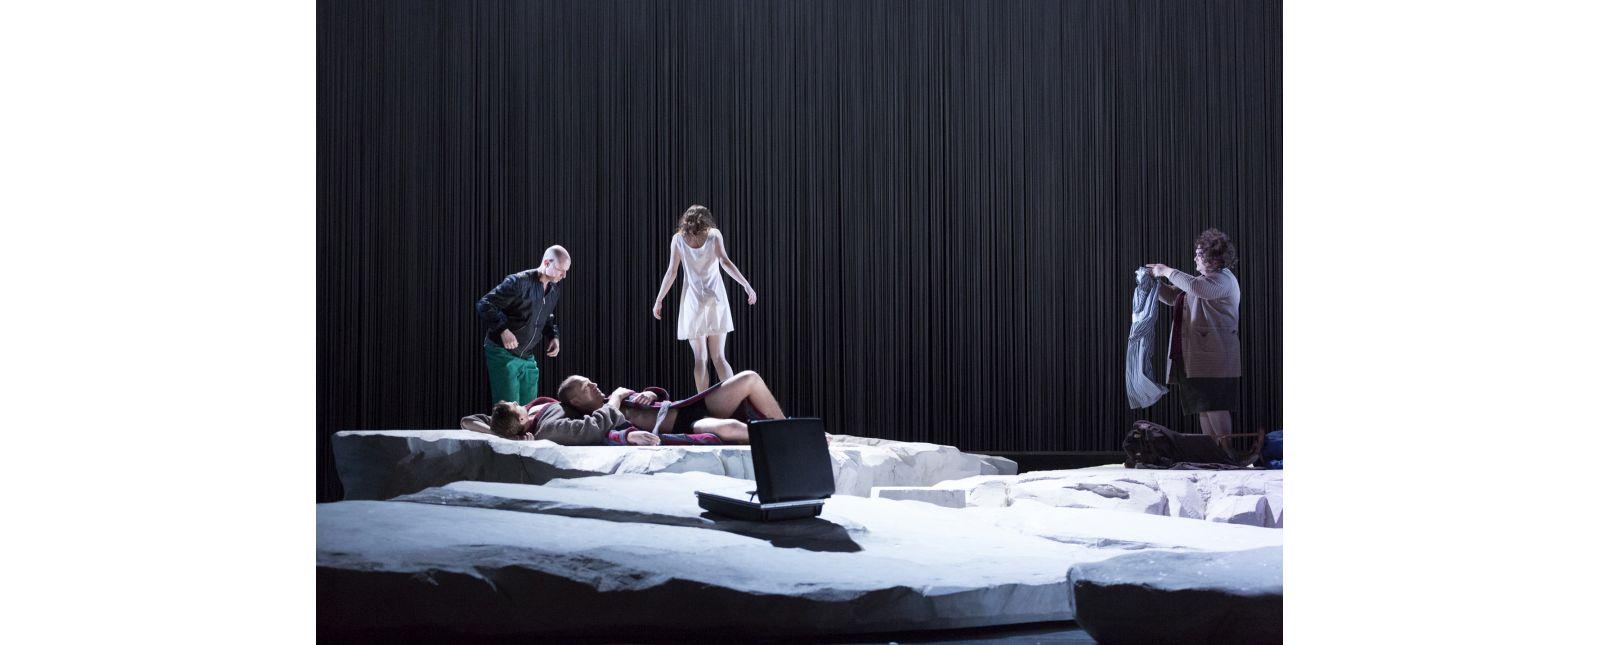 Angels in America // Bernhard Landauer, Joshua Kohl, John Carpenter, Inga Schäfer, Anja Jung // Rainer Muranyi // 2018